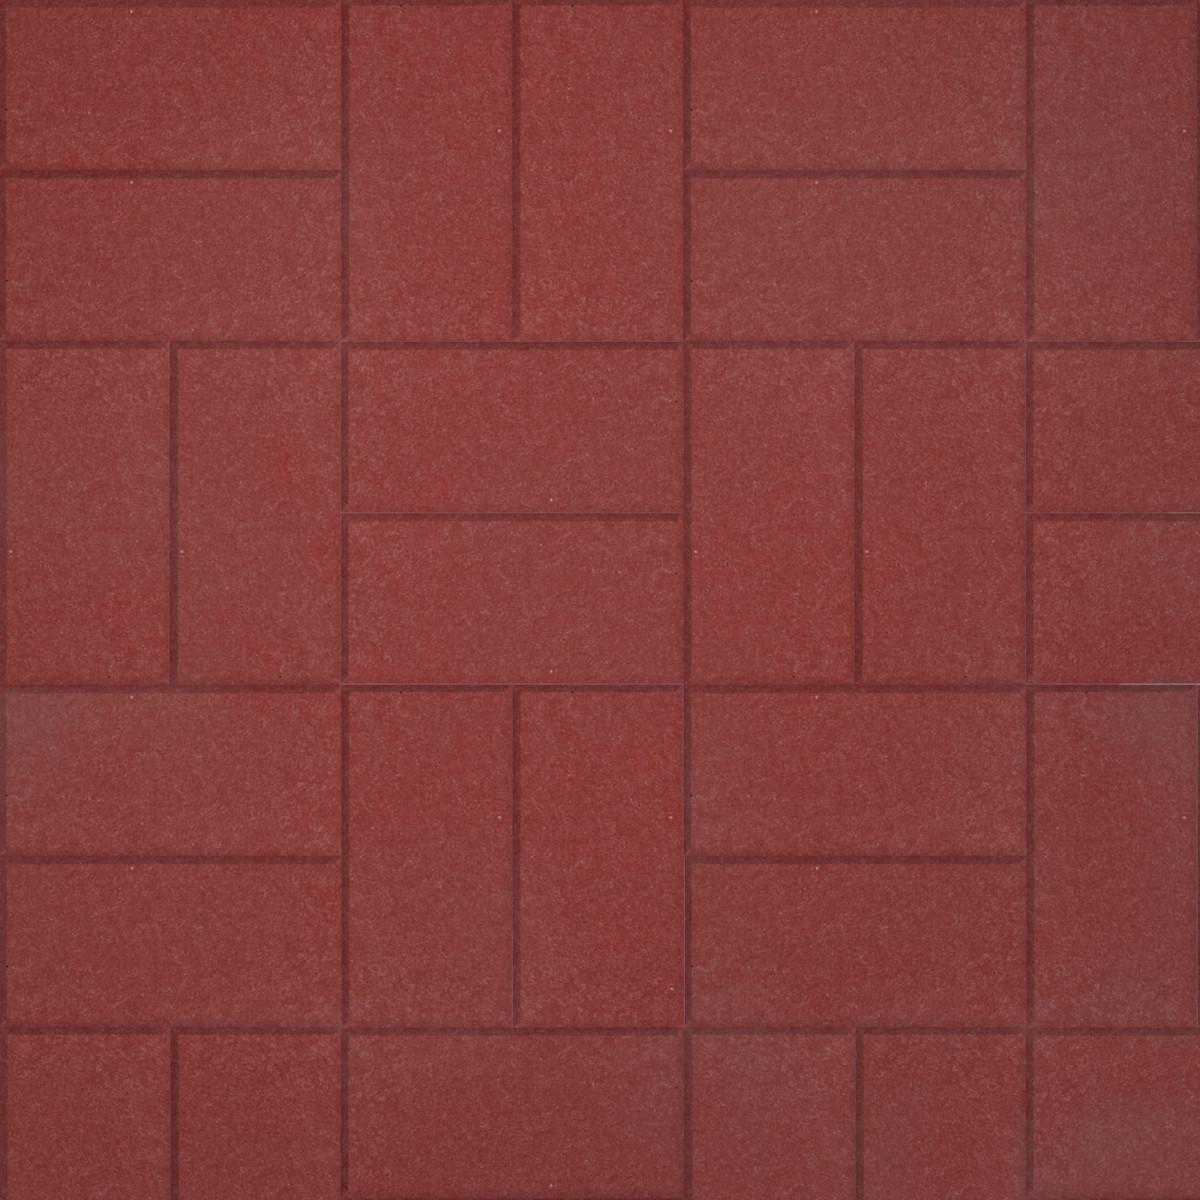 Тротуарная плитка Кирпичик 200х100х60 мм красный